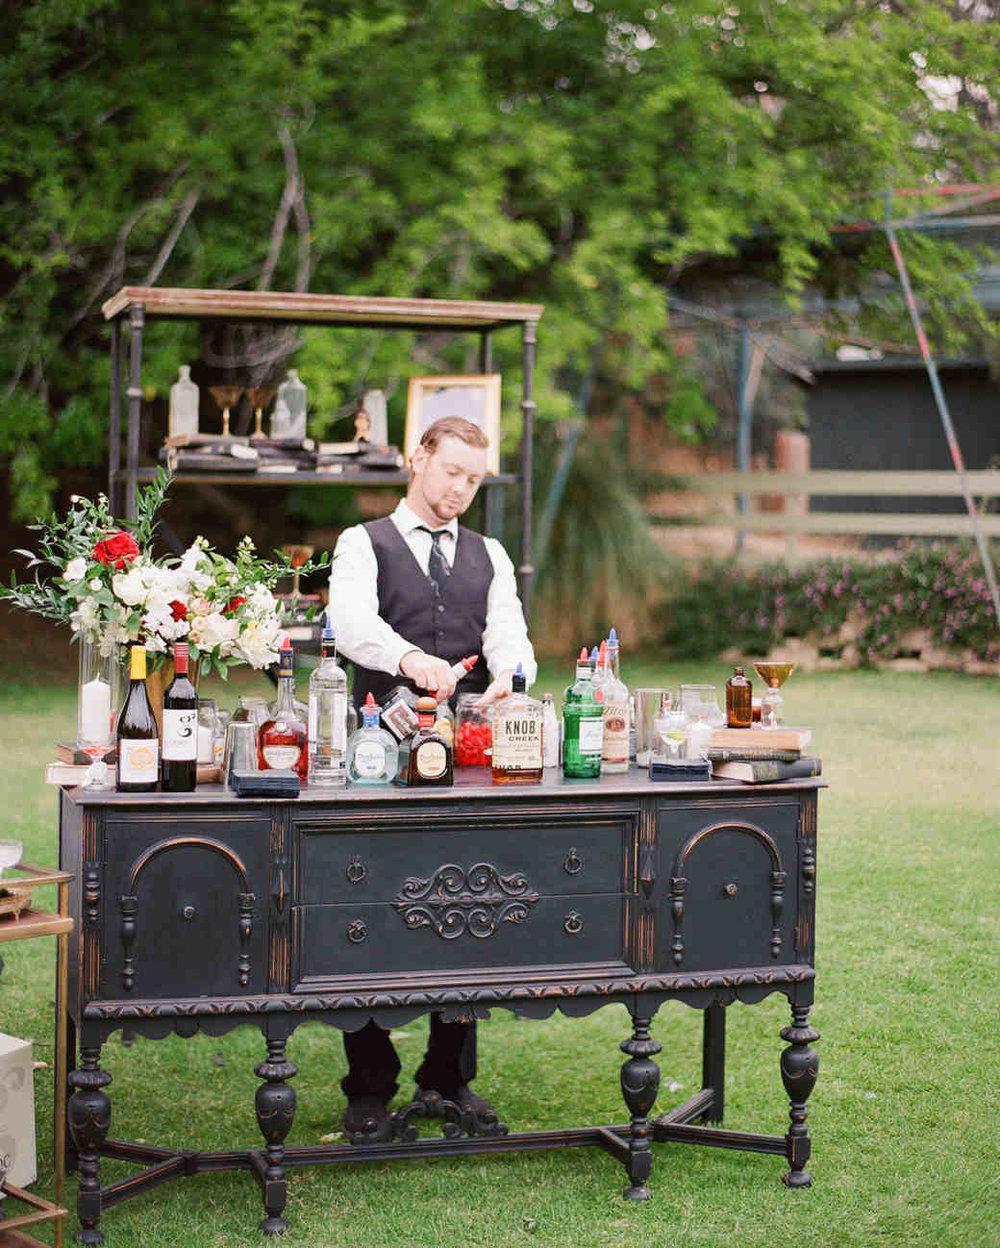 shannon-jon-wedding-bar-0539-6238579-0117_vert.jpg